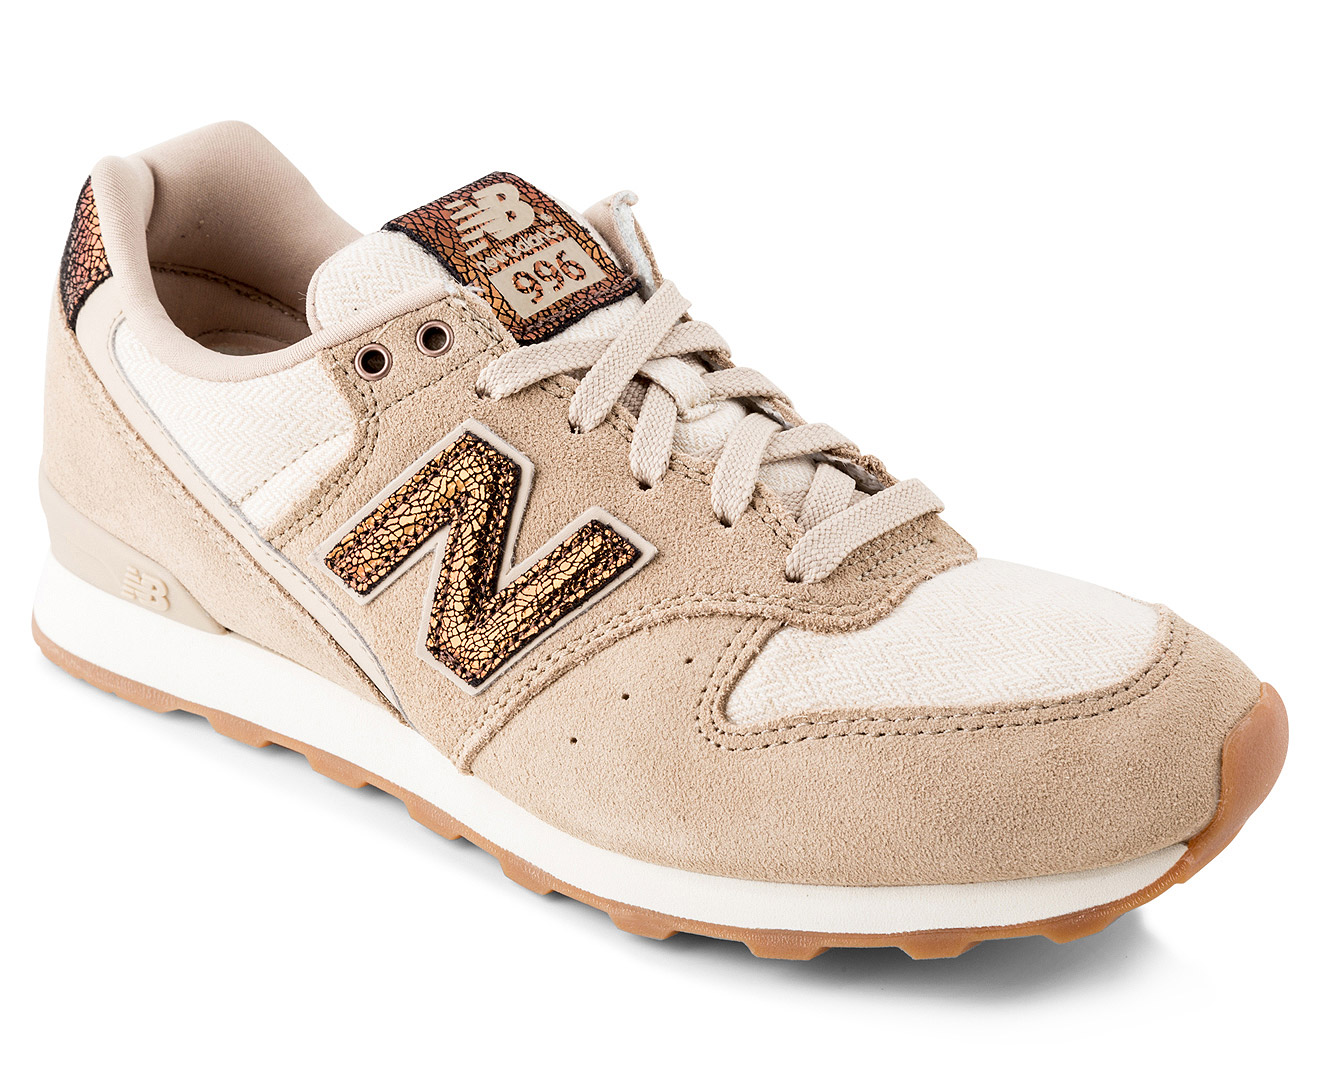 New Balance Shoe Sizing Kids